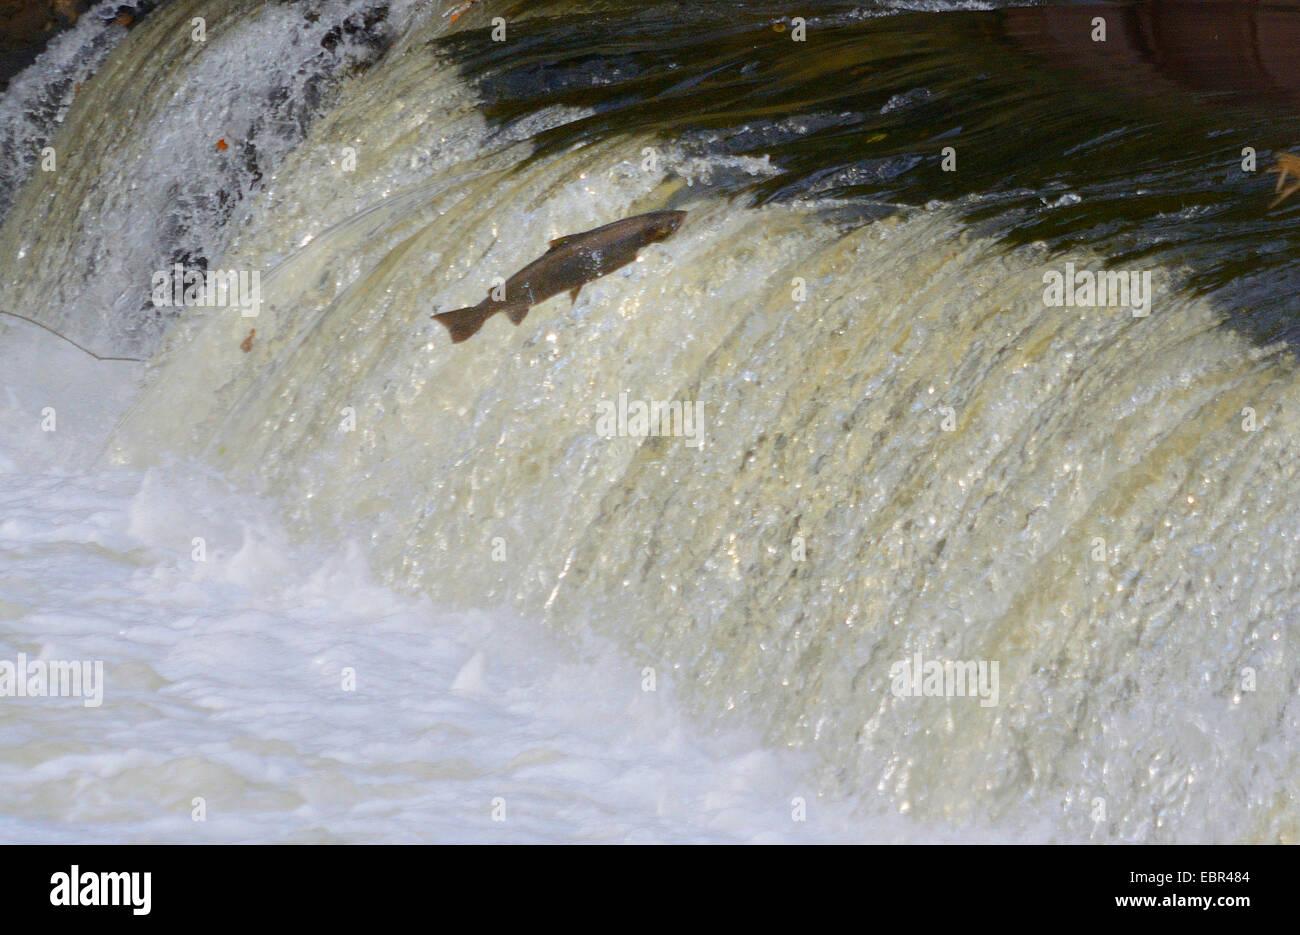 Atlantic salmon, ouananiche, lake Atlantic salmon, landlocked salmon, Sebago salmon (Salmo salar), salmon jumping Stock Photo